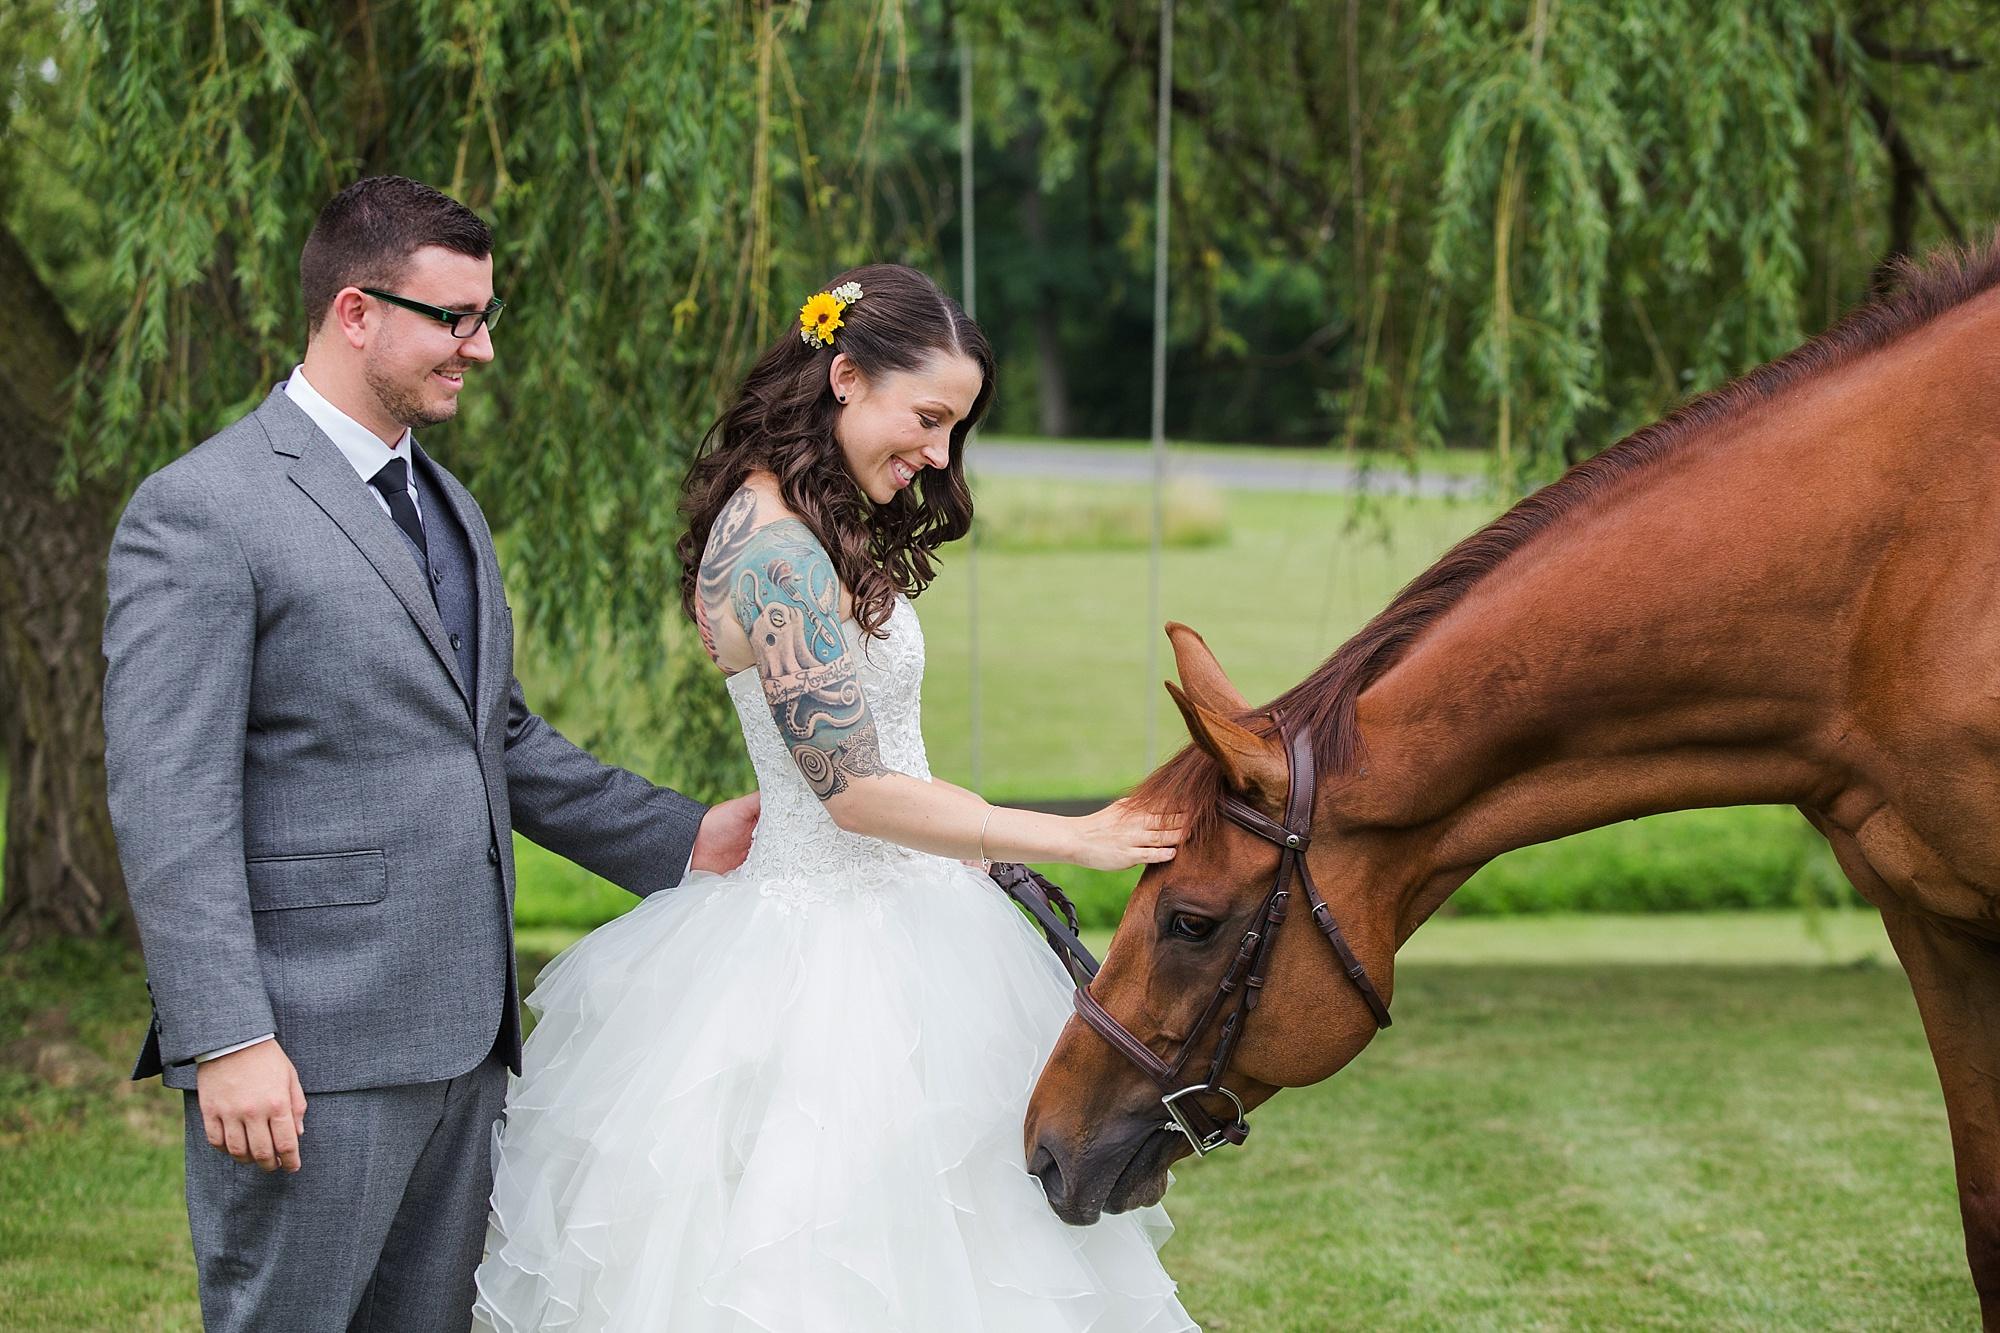 lipapark-hernderwinery-wedding_0048.jpg